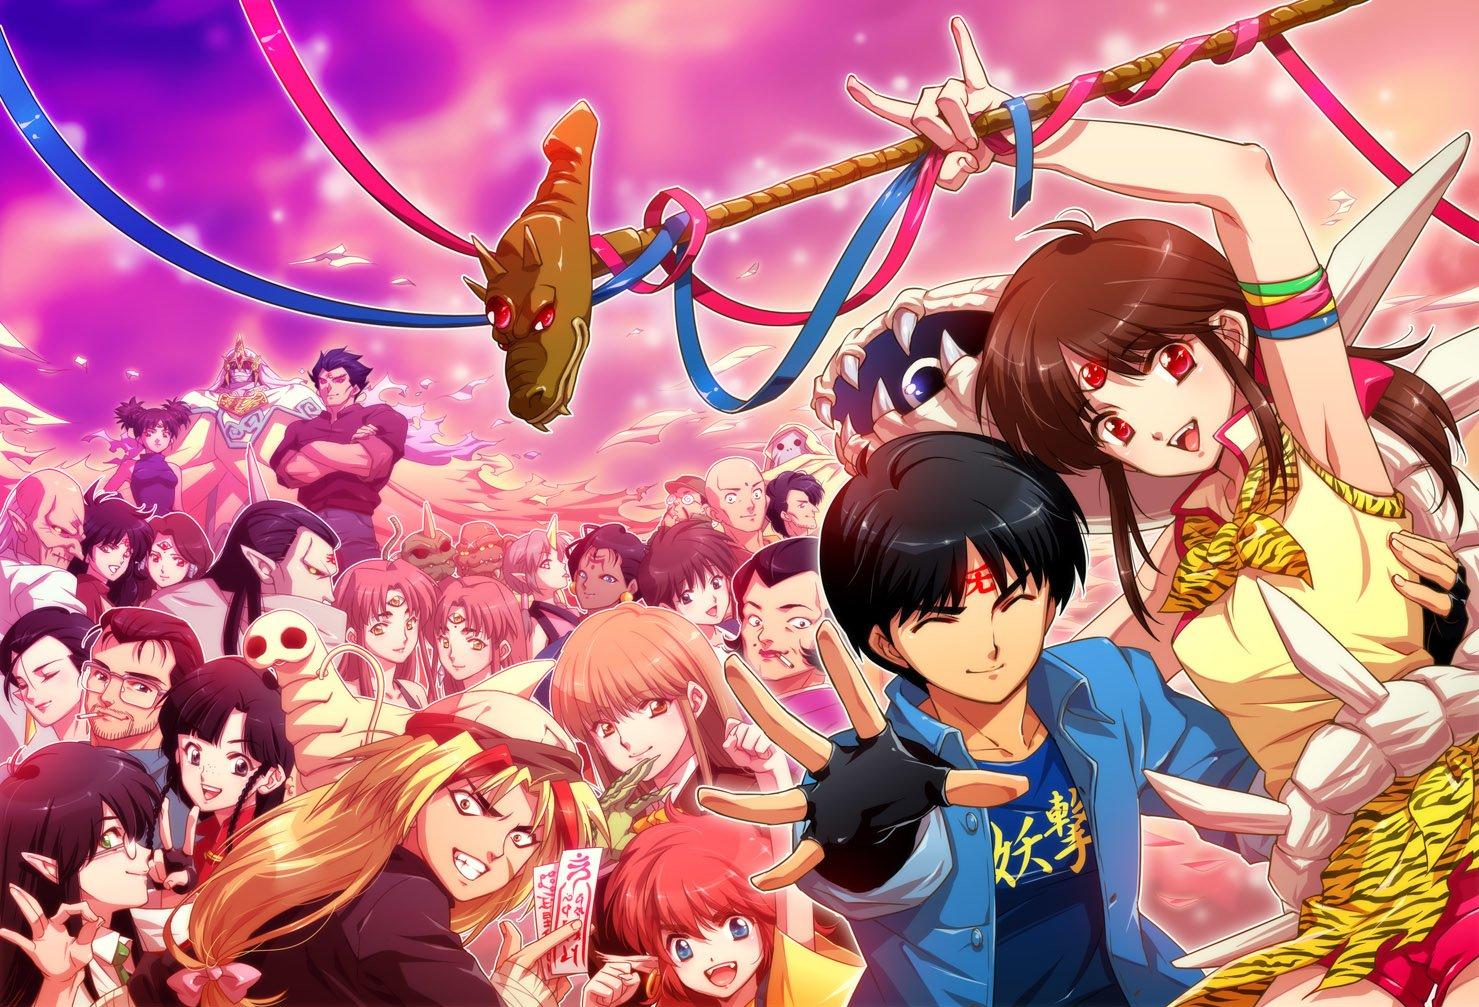 Anime - 3x3 Eyes  Wallpaper